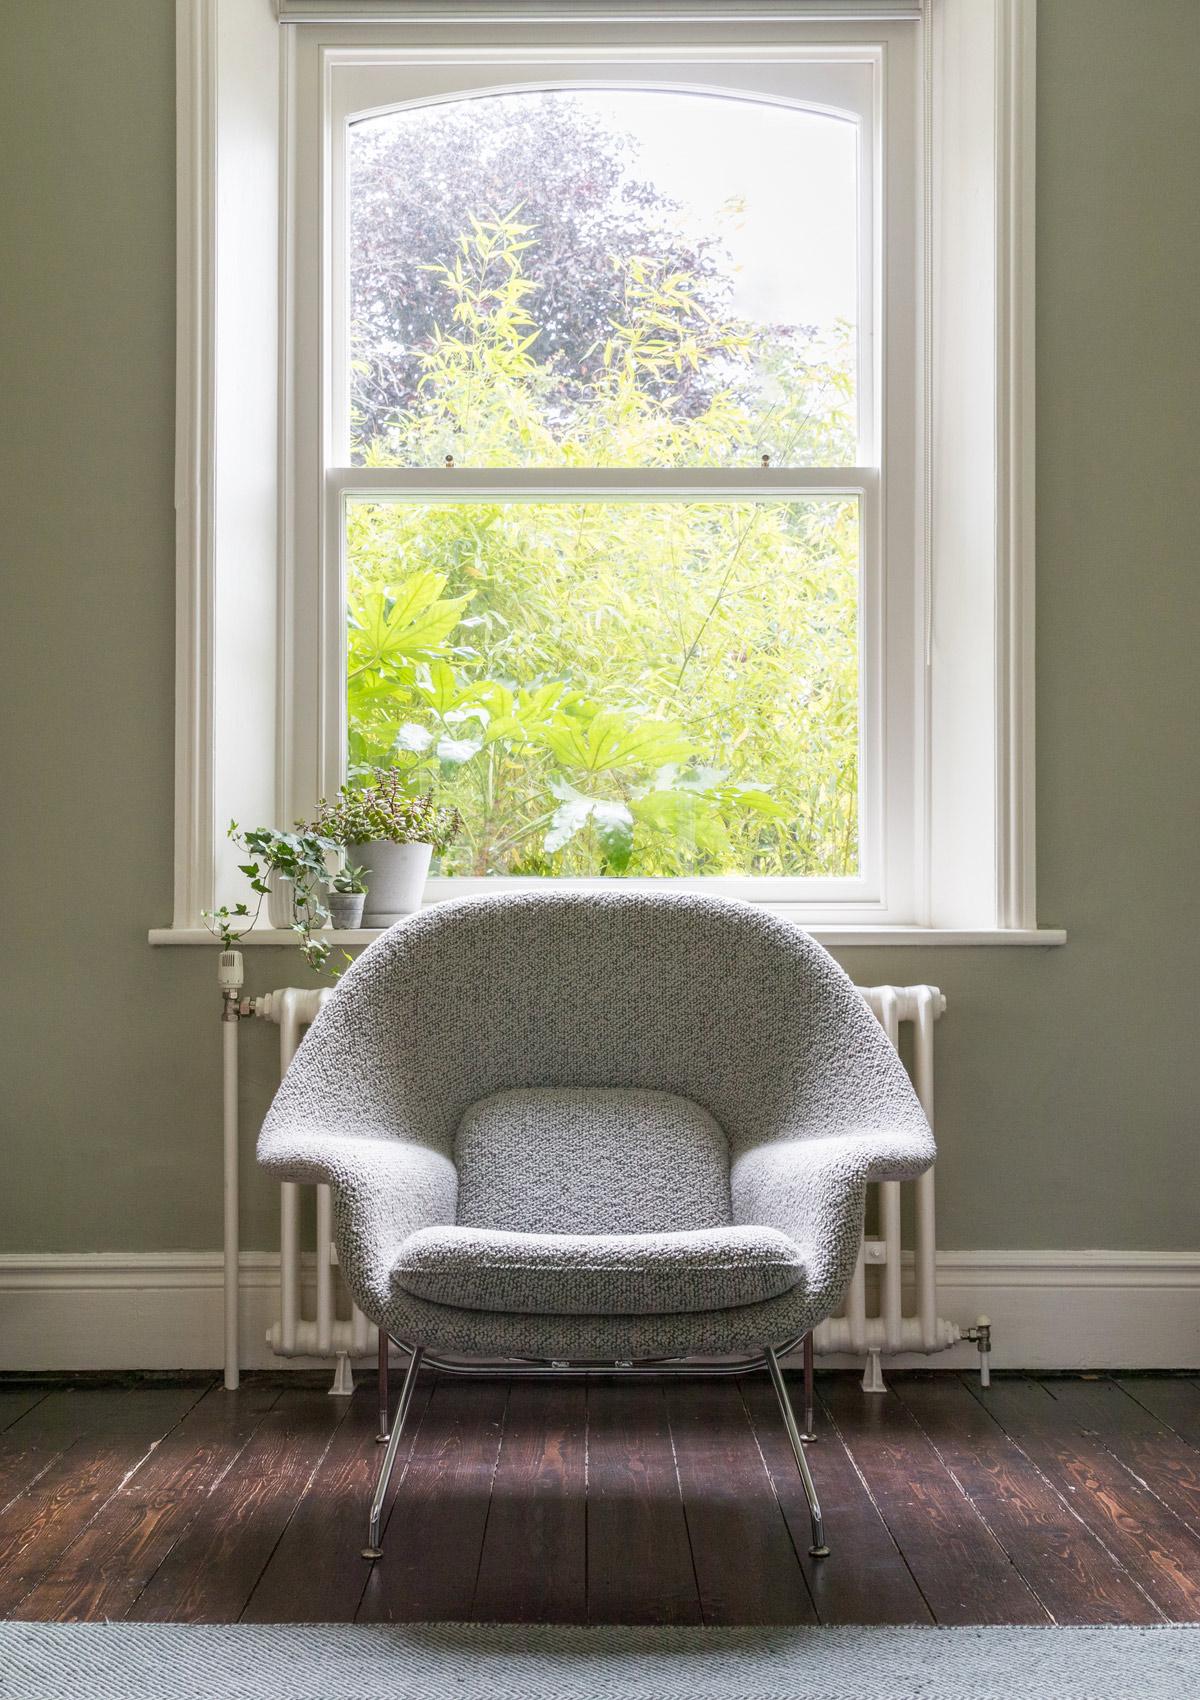 Nestcouk-Top-Design-Picks-Knoll-Womb-Chair.jpg